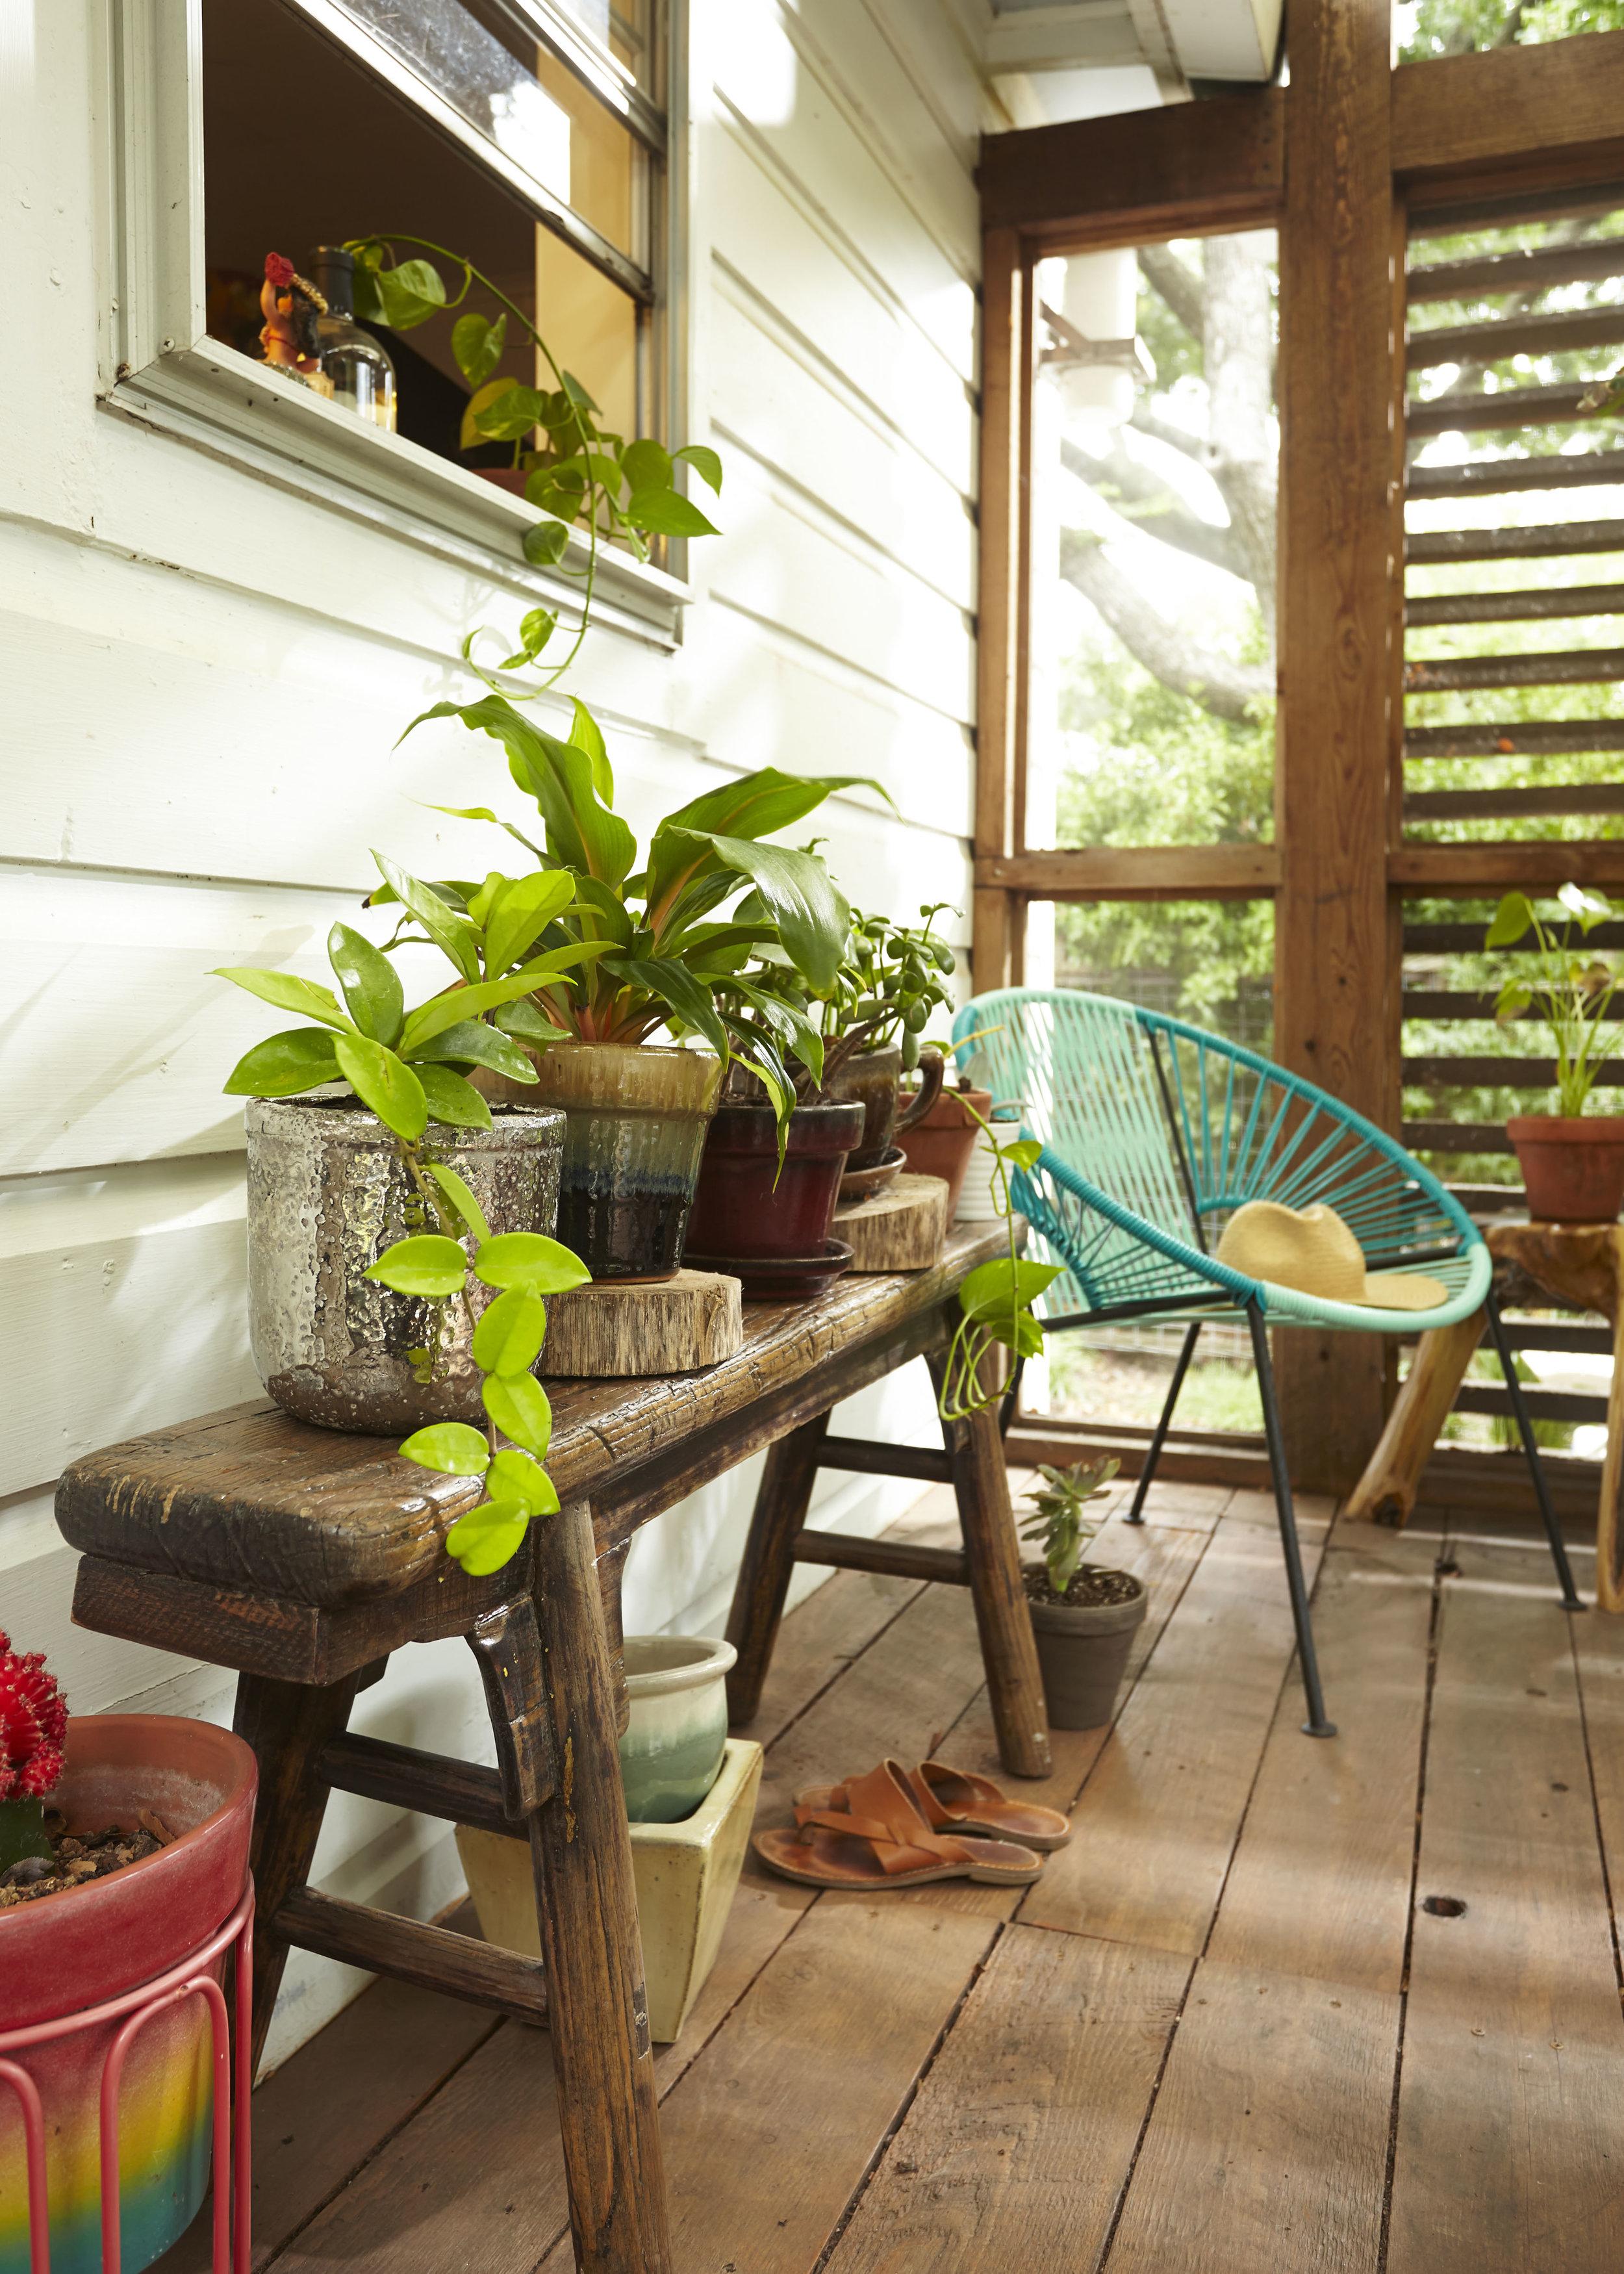 Melanie_Tarver_patio_bench.jpg